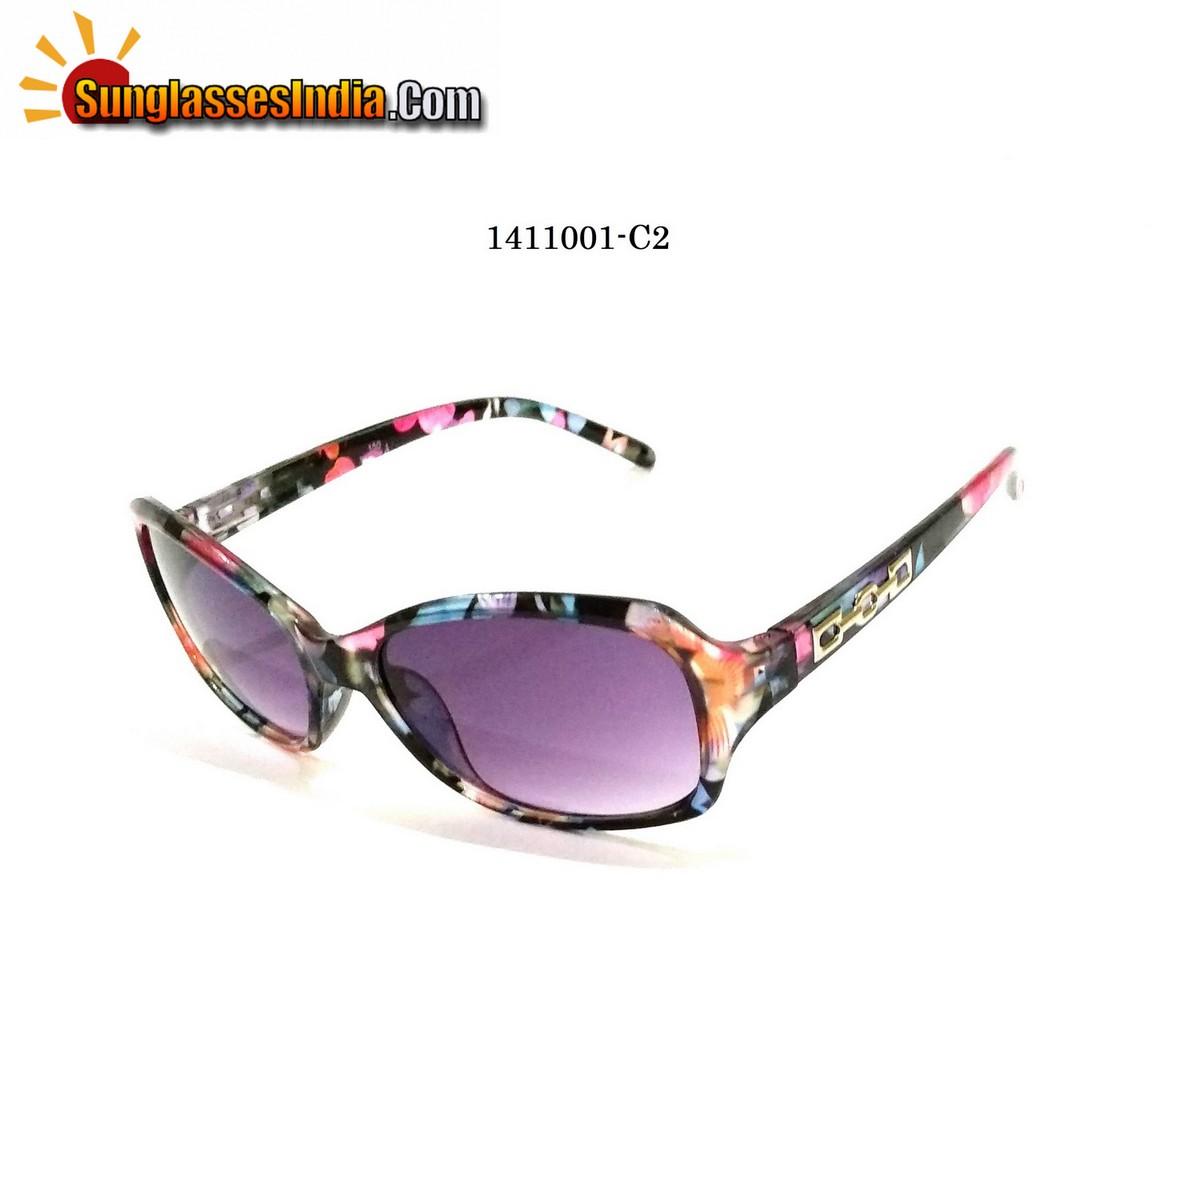 Floral Print Ladies Women Sunglasses Model 1141001C2